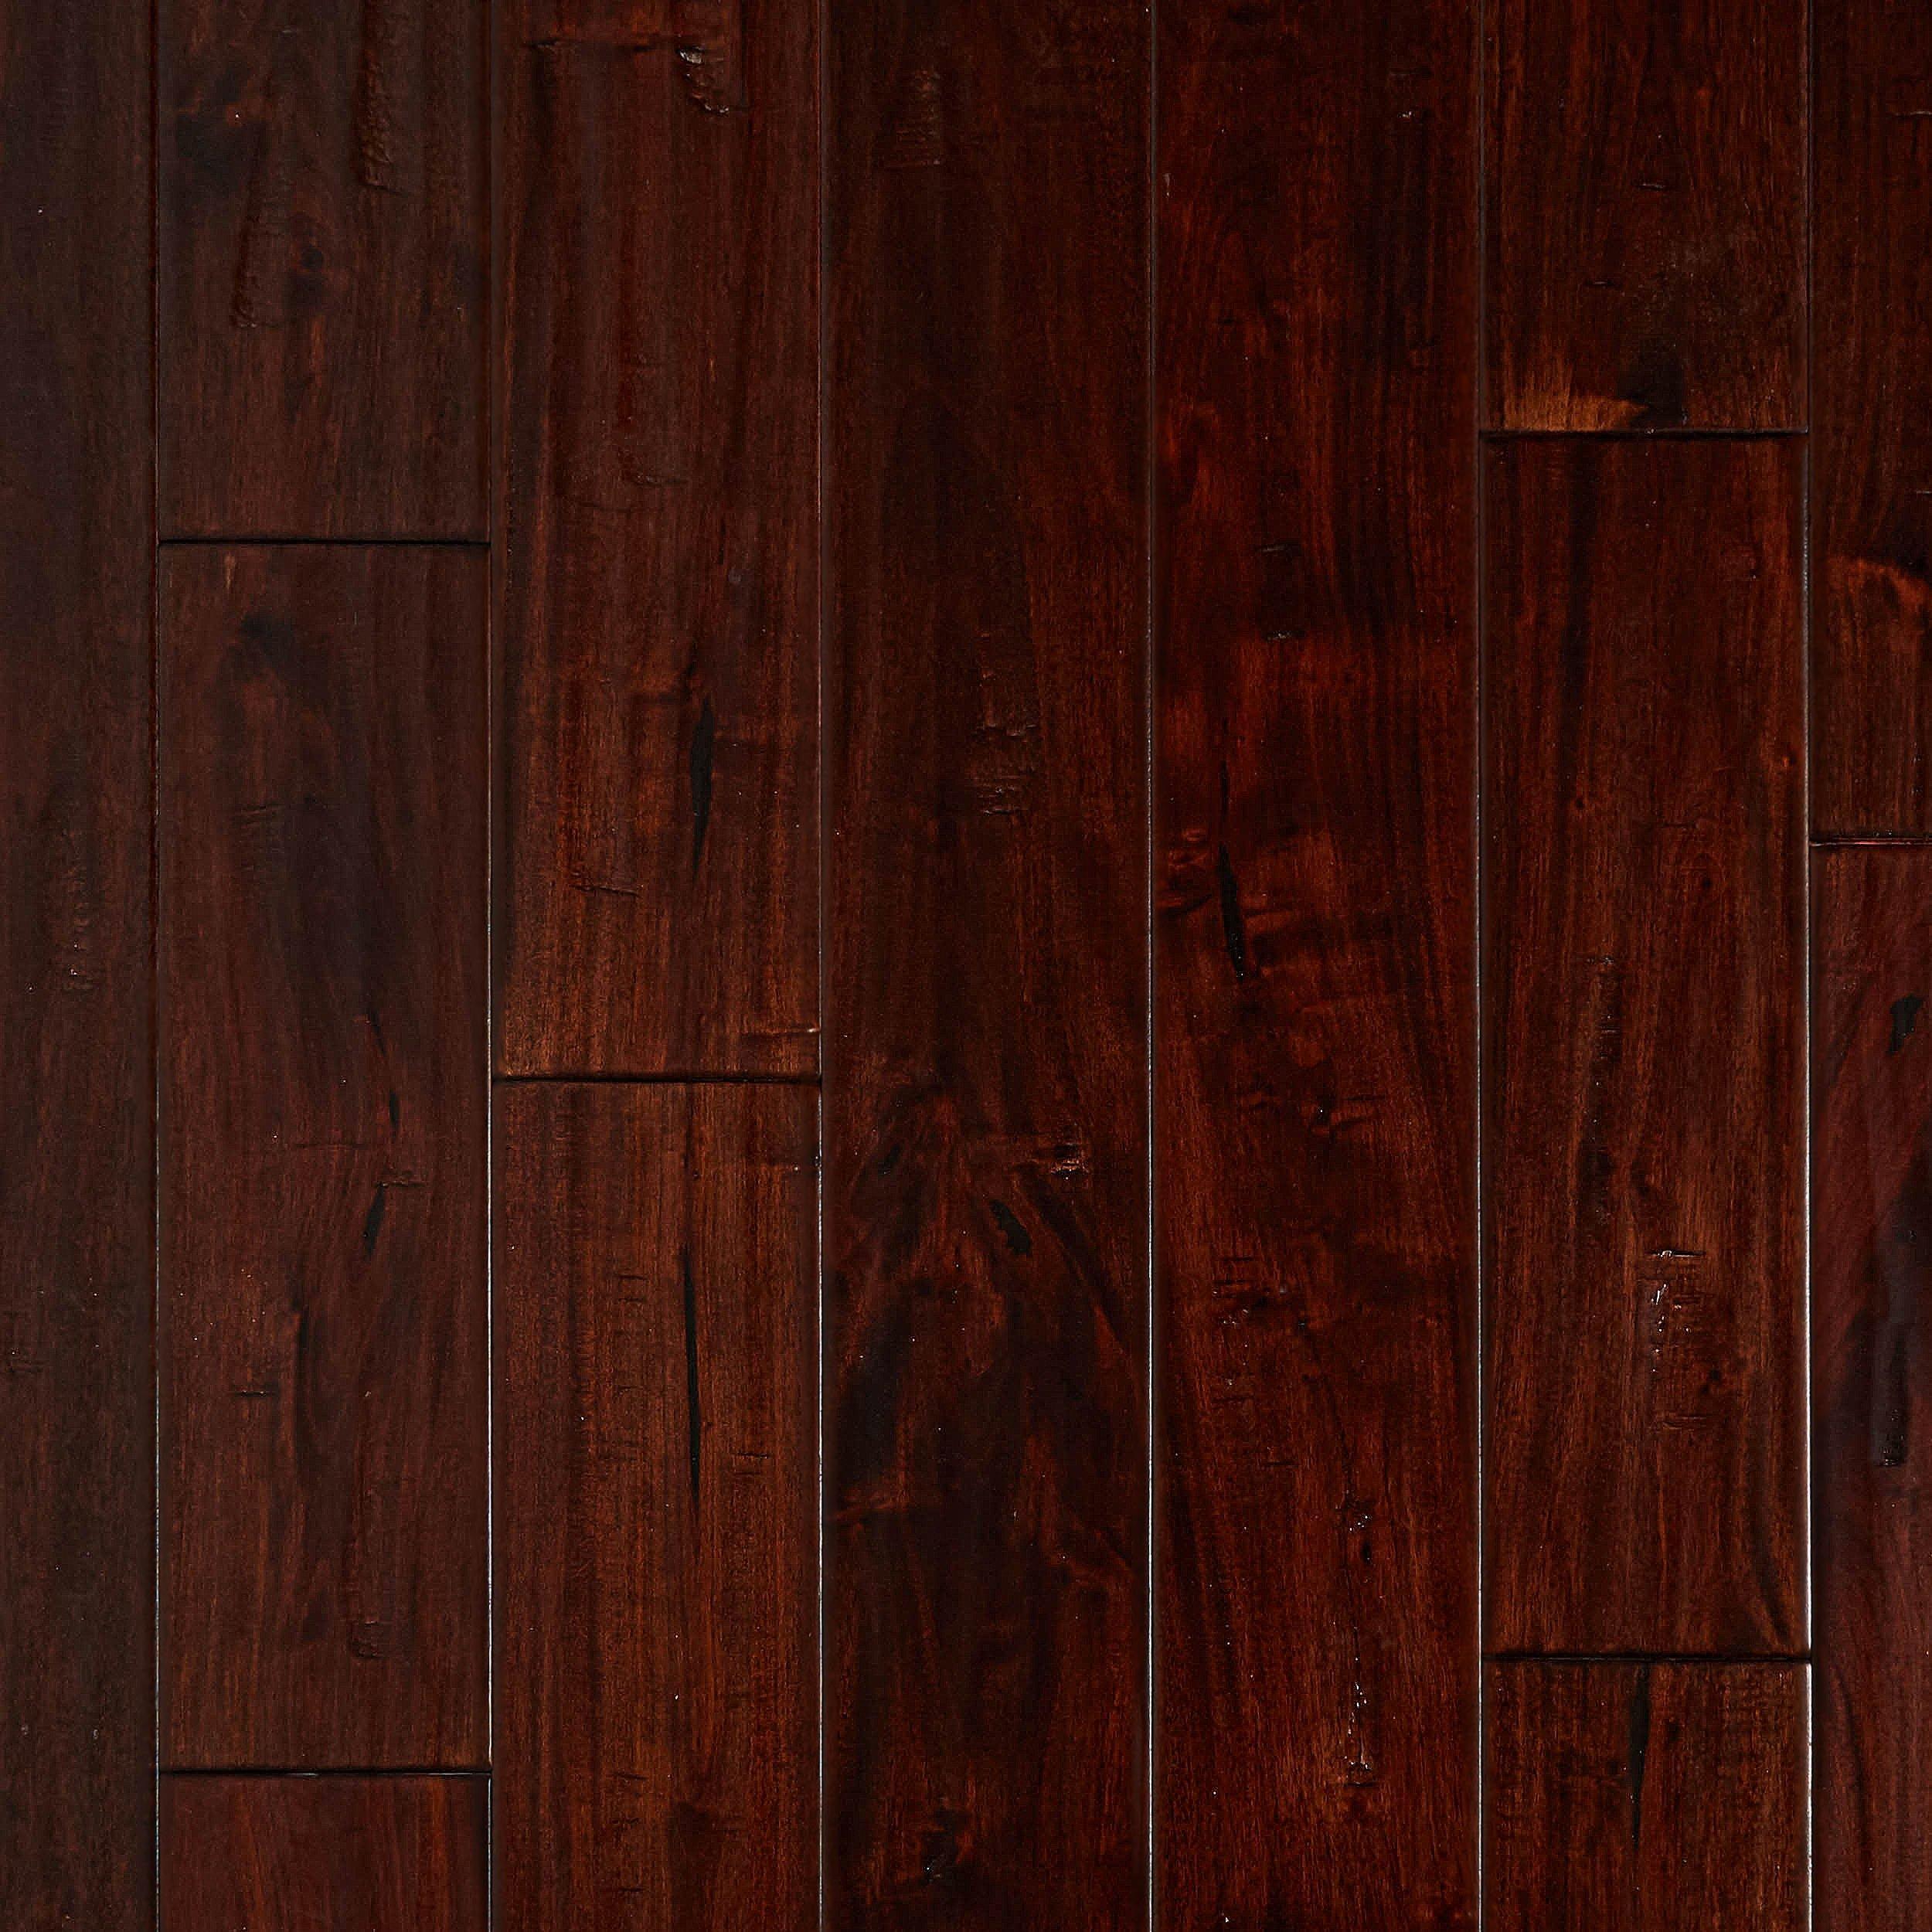 Lavella Mahogany Handscraped Solid Hardwood 5 8in X 4 3 4in